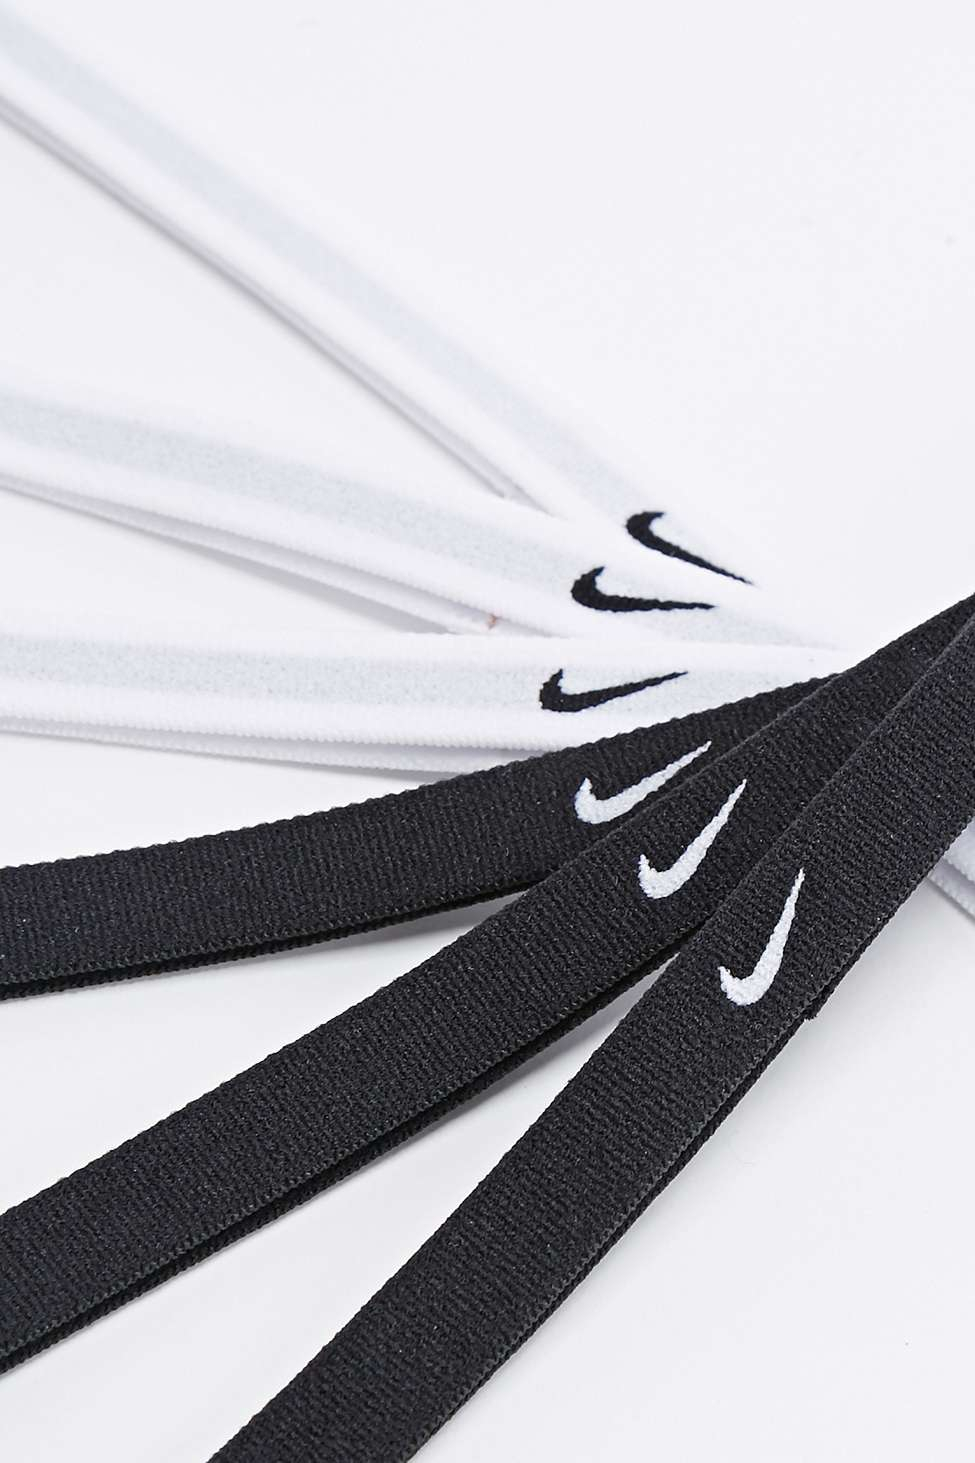 Nike Swoosh Headband 6-Pack In Black And White in Black - Lyst c1a21dfa8d5